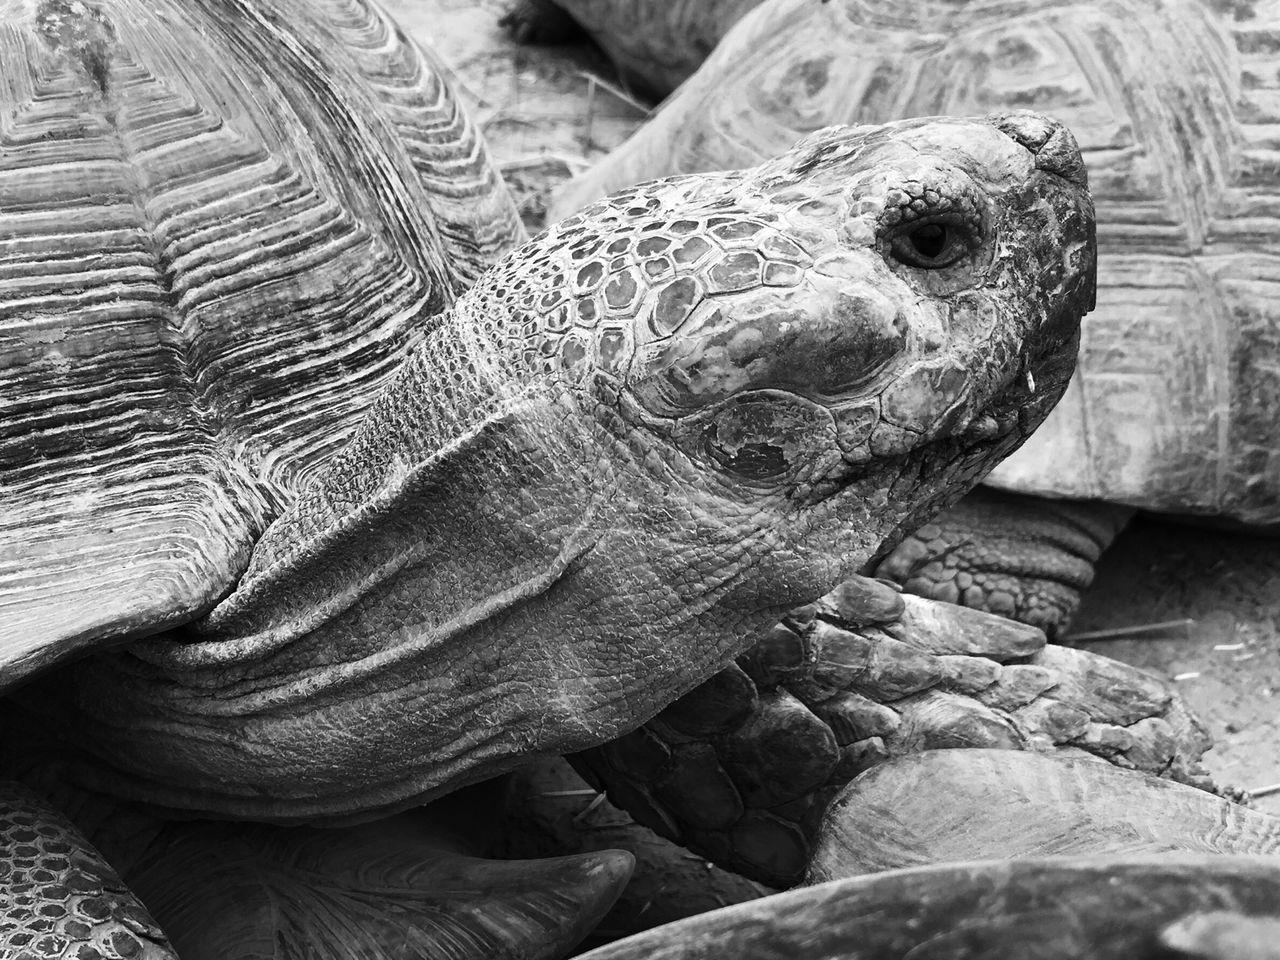 Giant Tortoises On Field